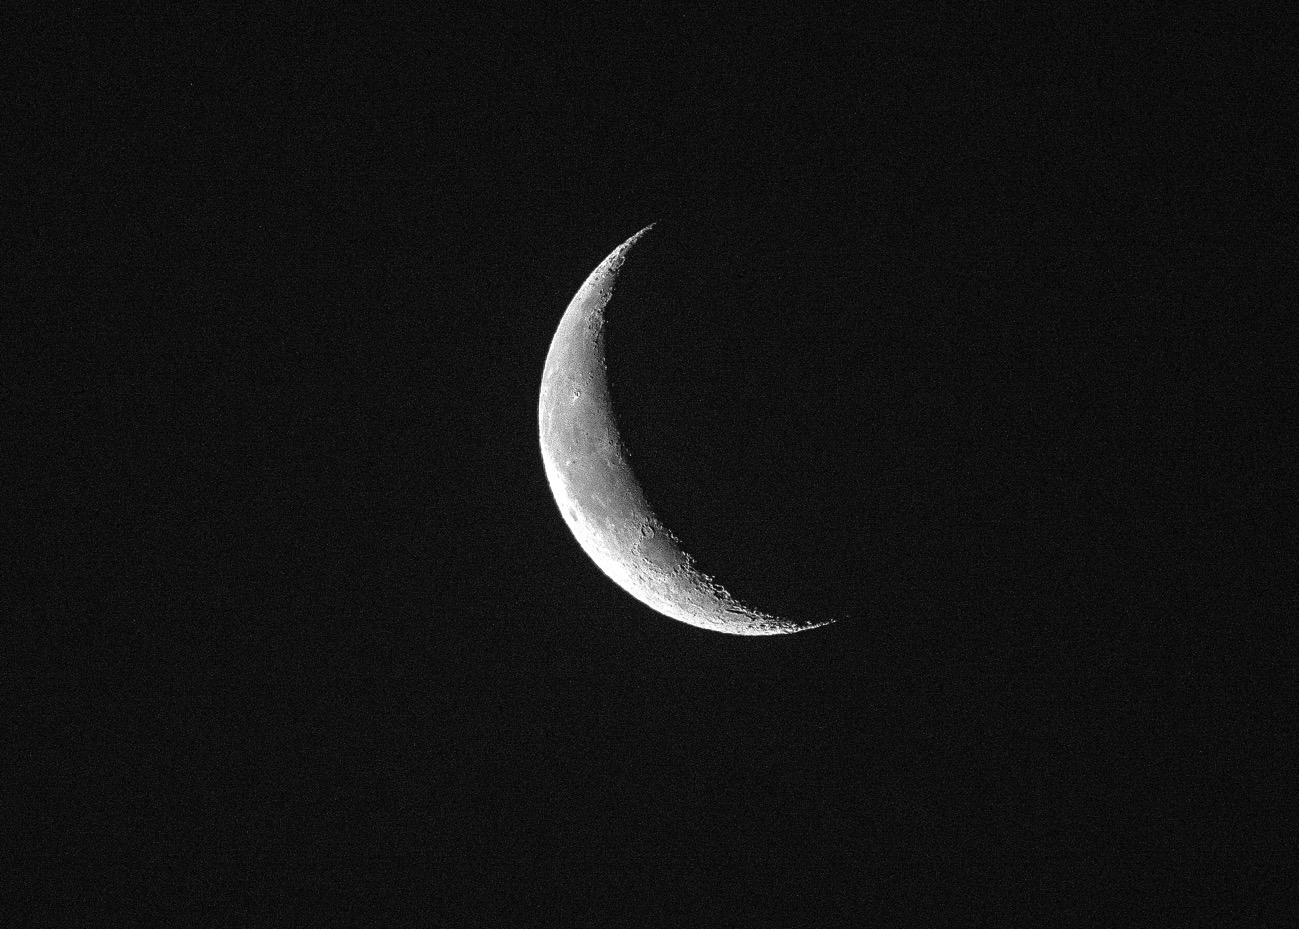 20190302moring moon2